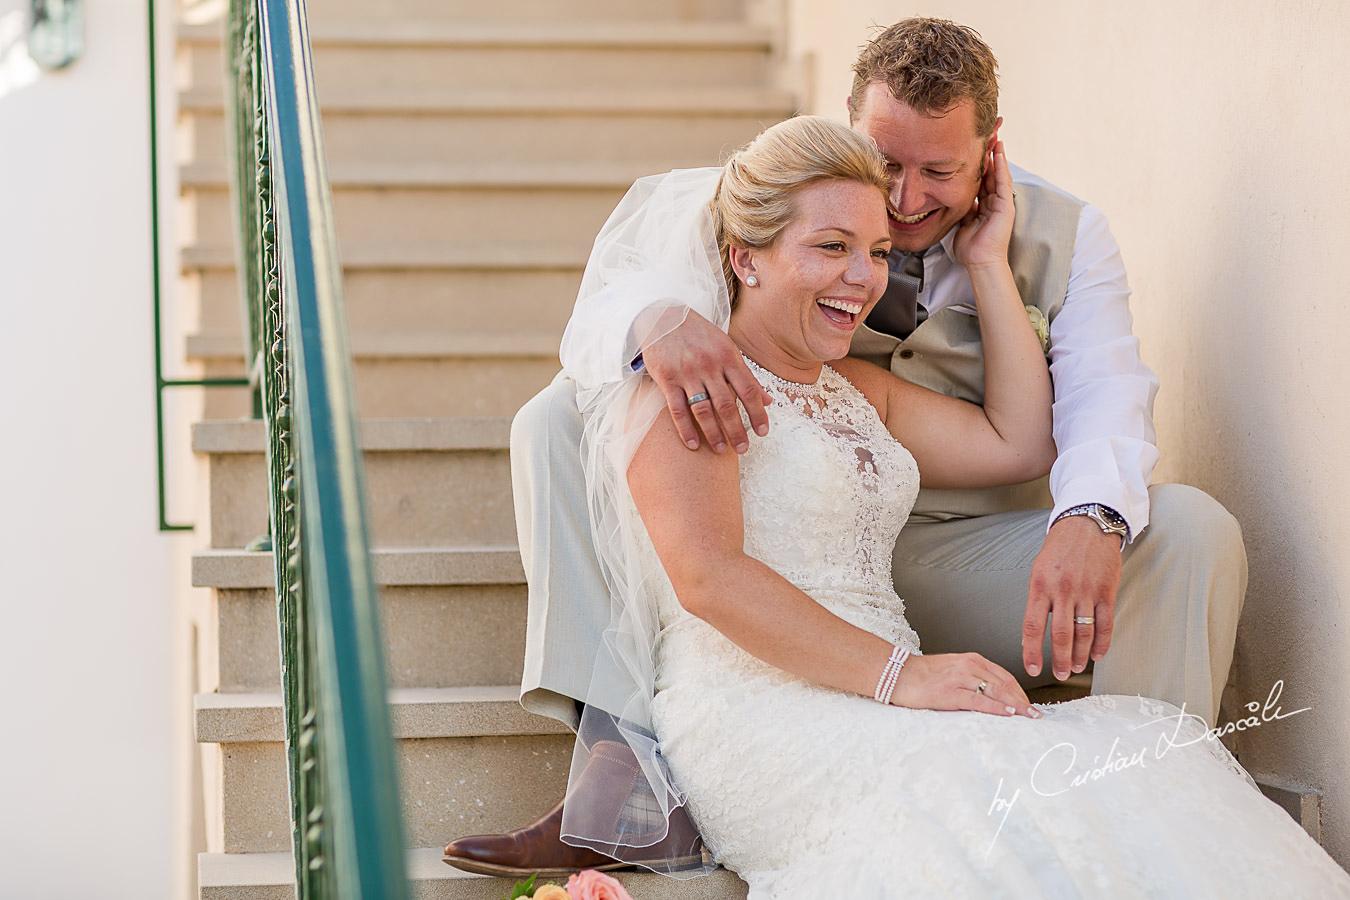 Wedding Photography at Aliathon Beach Holiday - 51